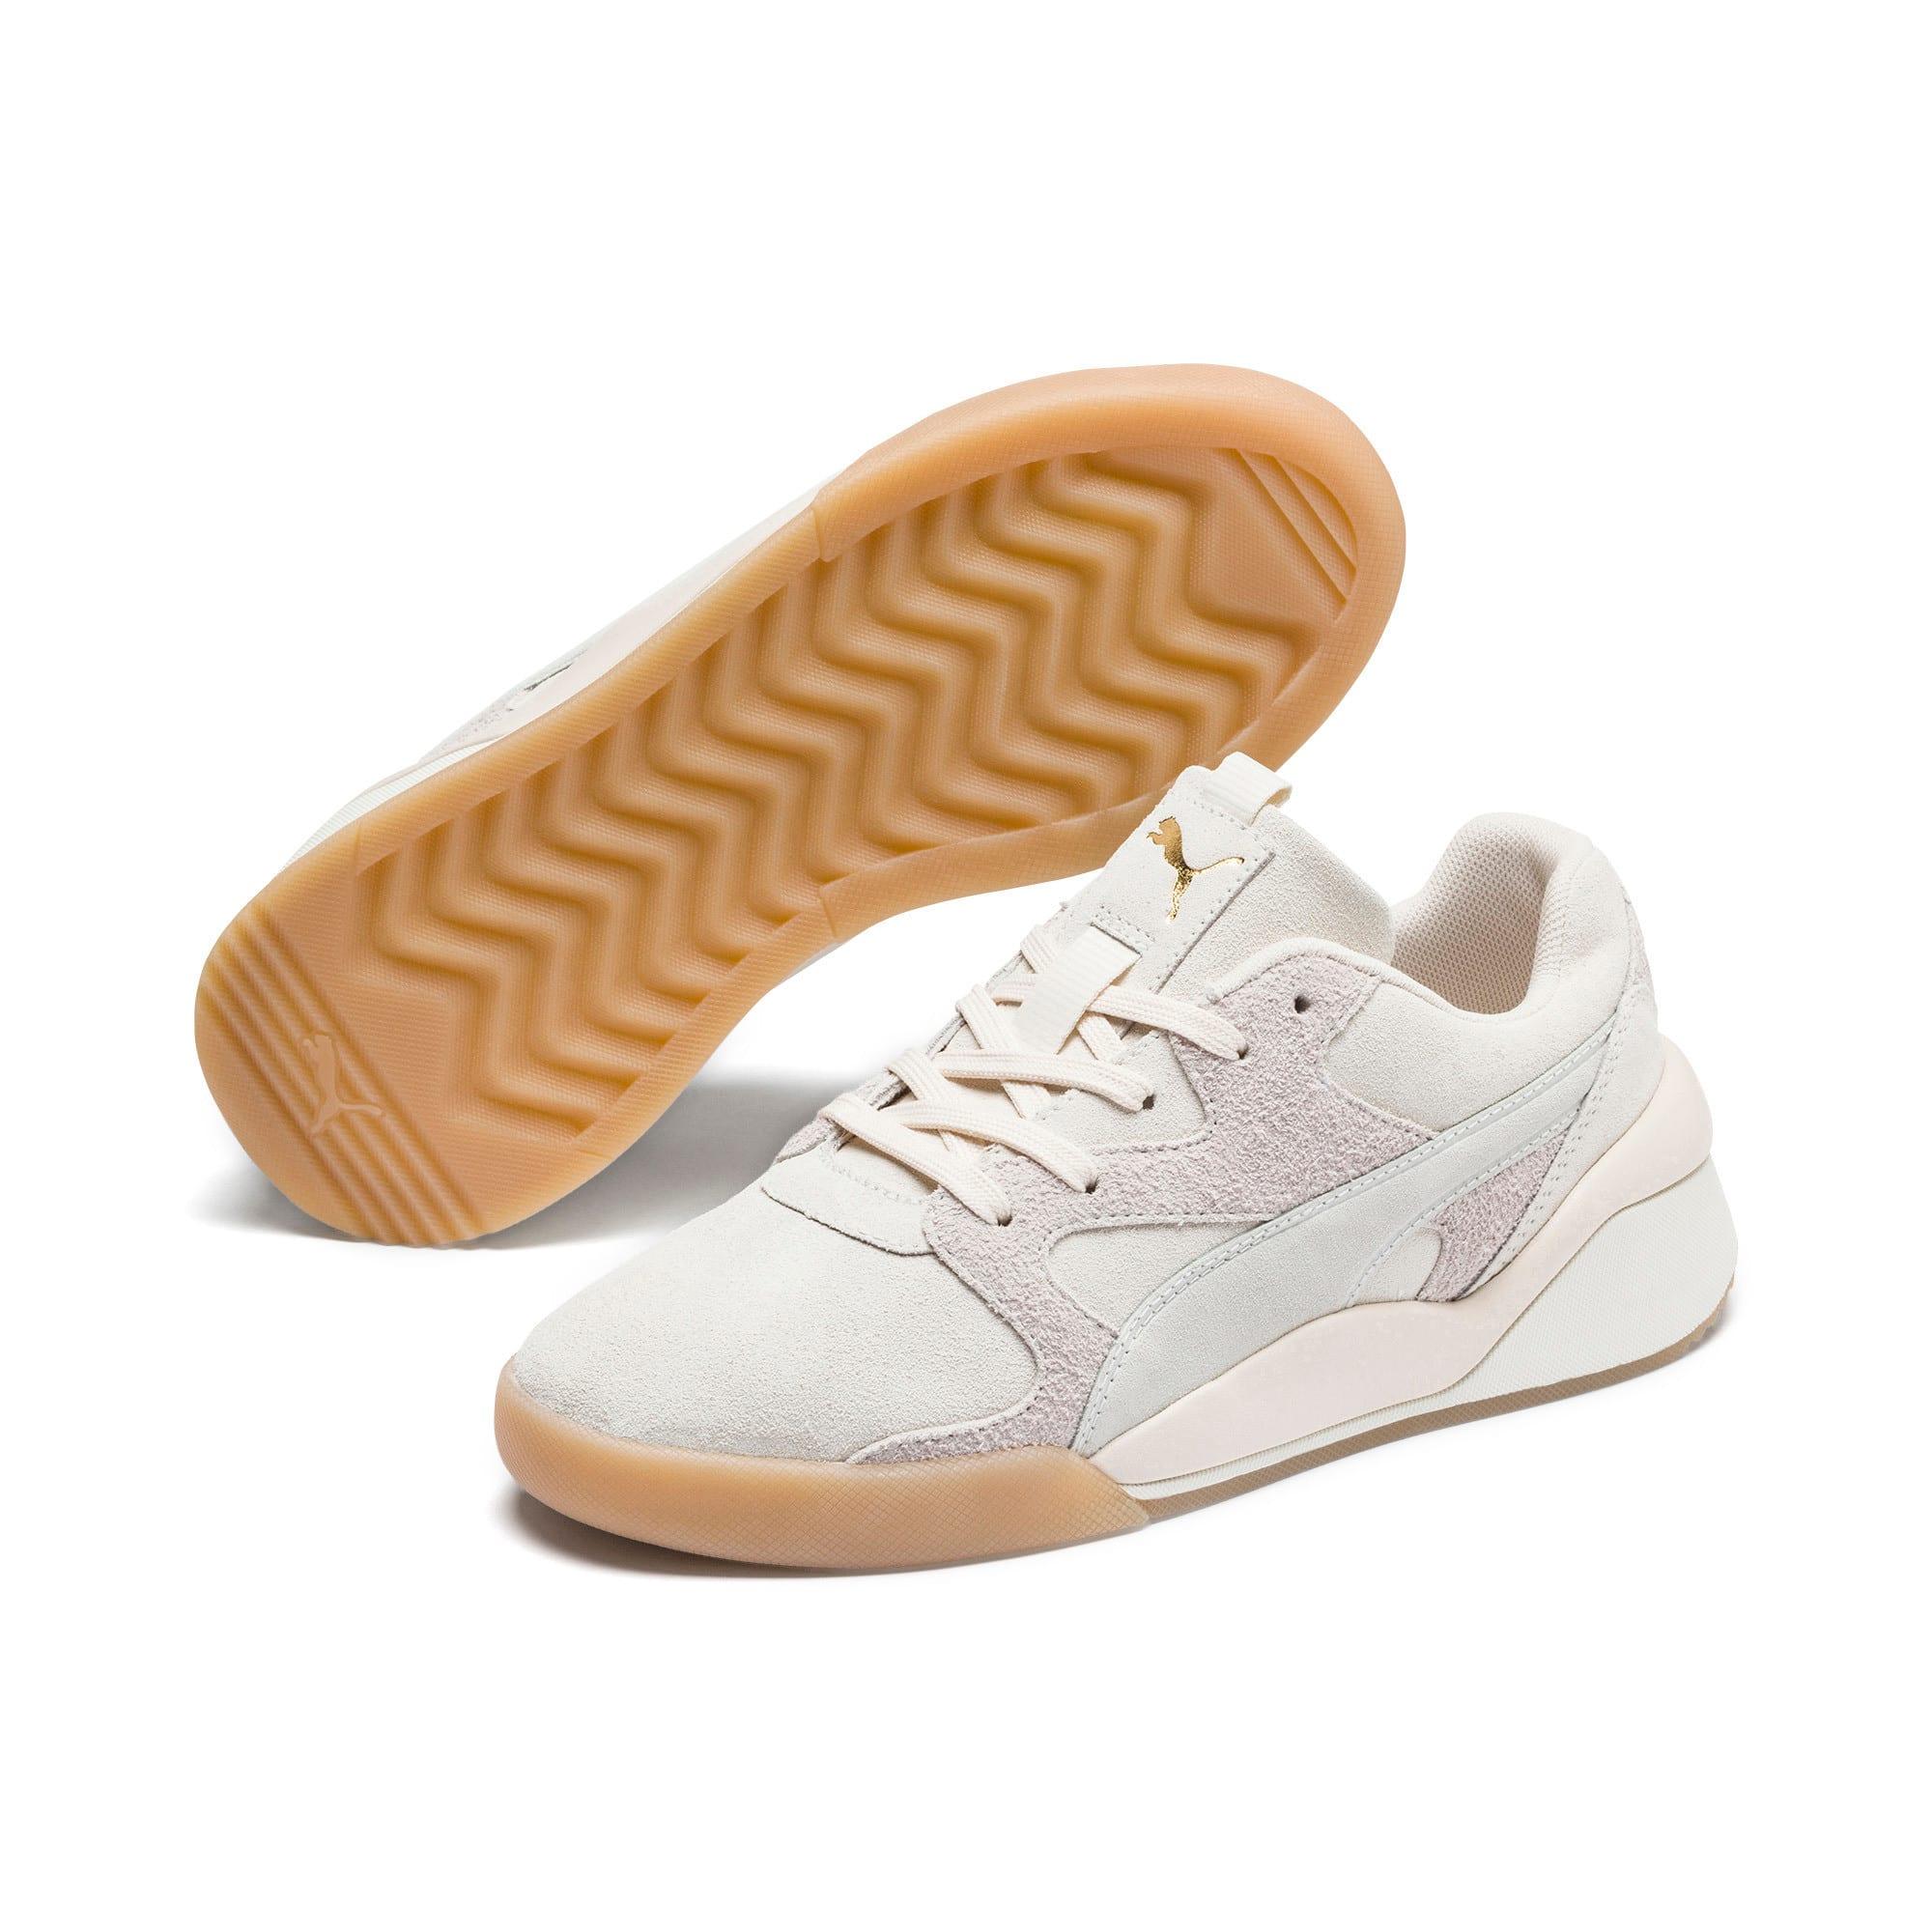 Thumbnail 3 of Aeon Rewind Women's Sneakers, Pastel Parchment, medium